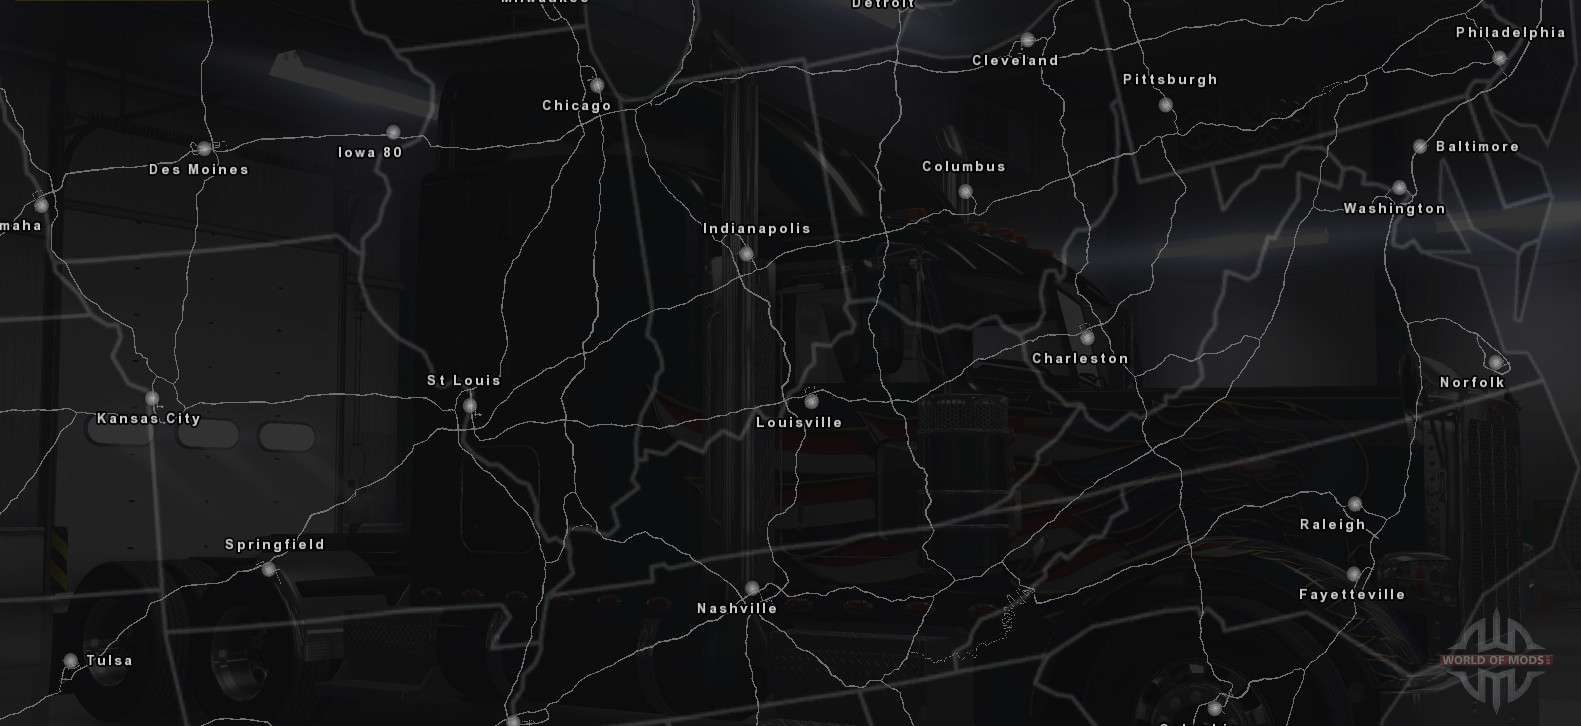 american truck simulator map 2017